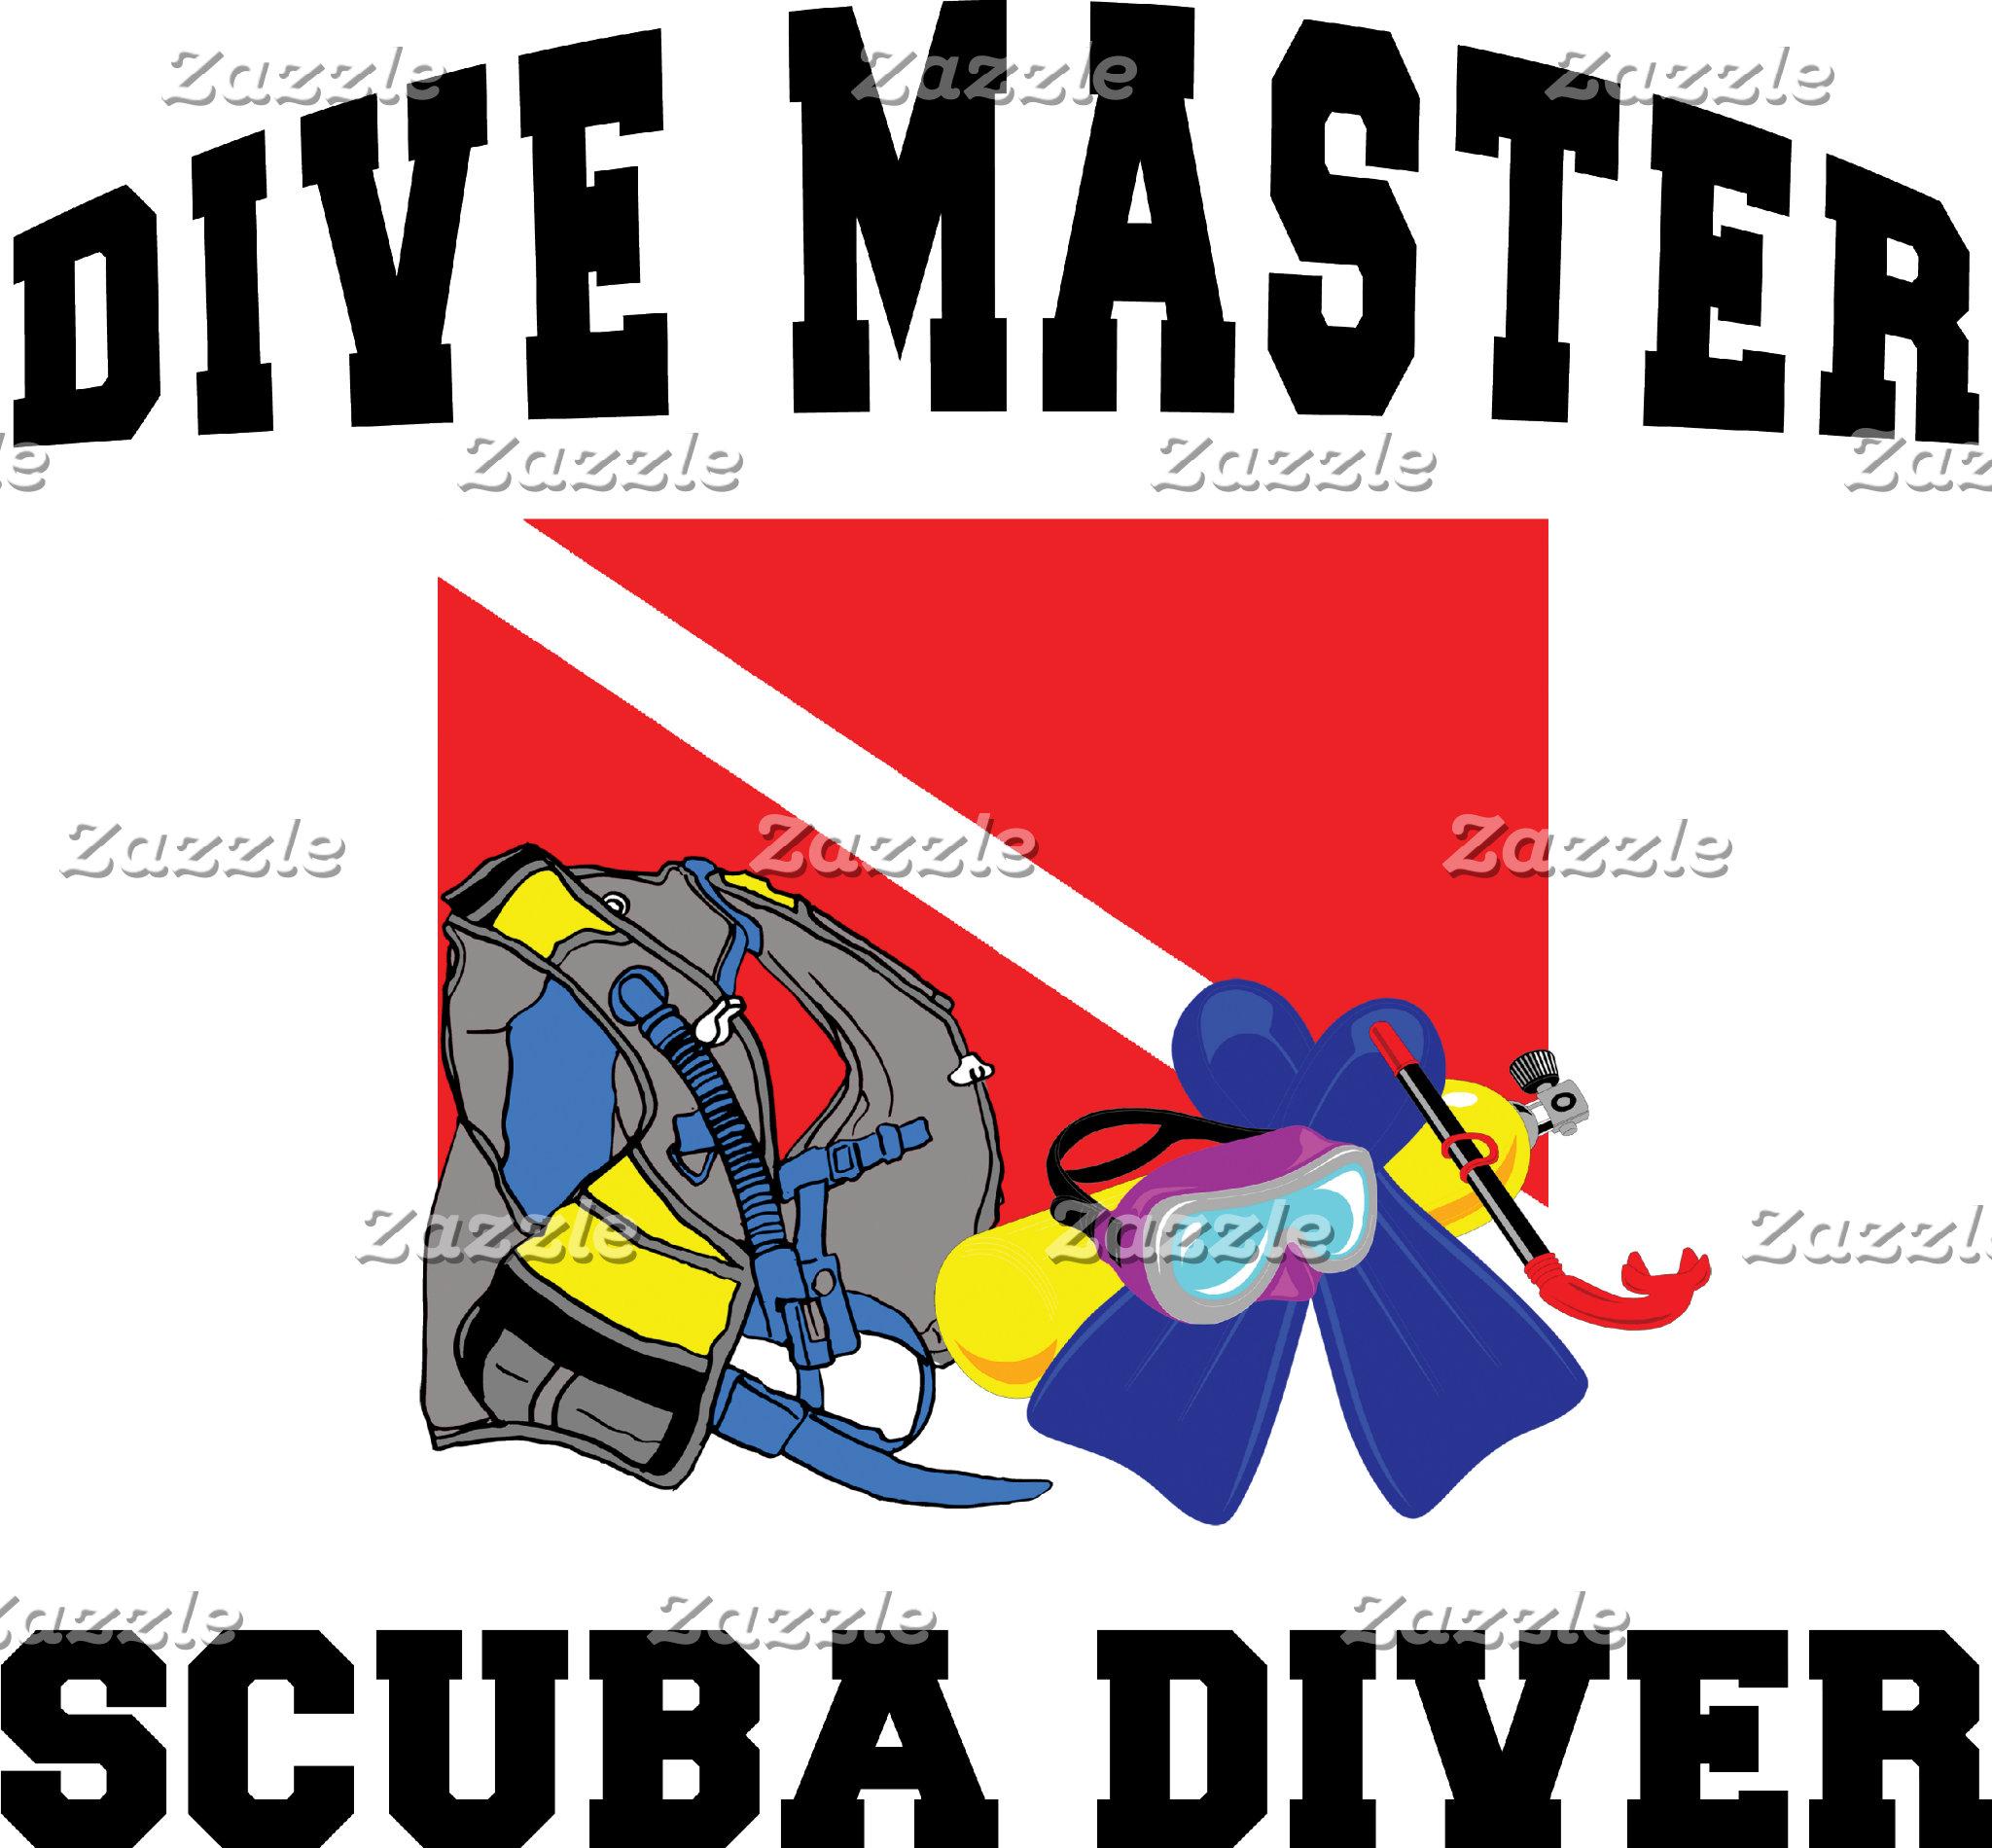 Dive Master SCUBA Diver T-Shirt Gifts